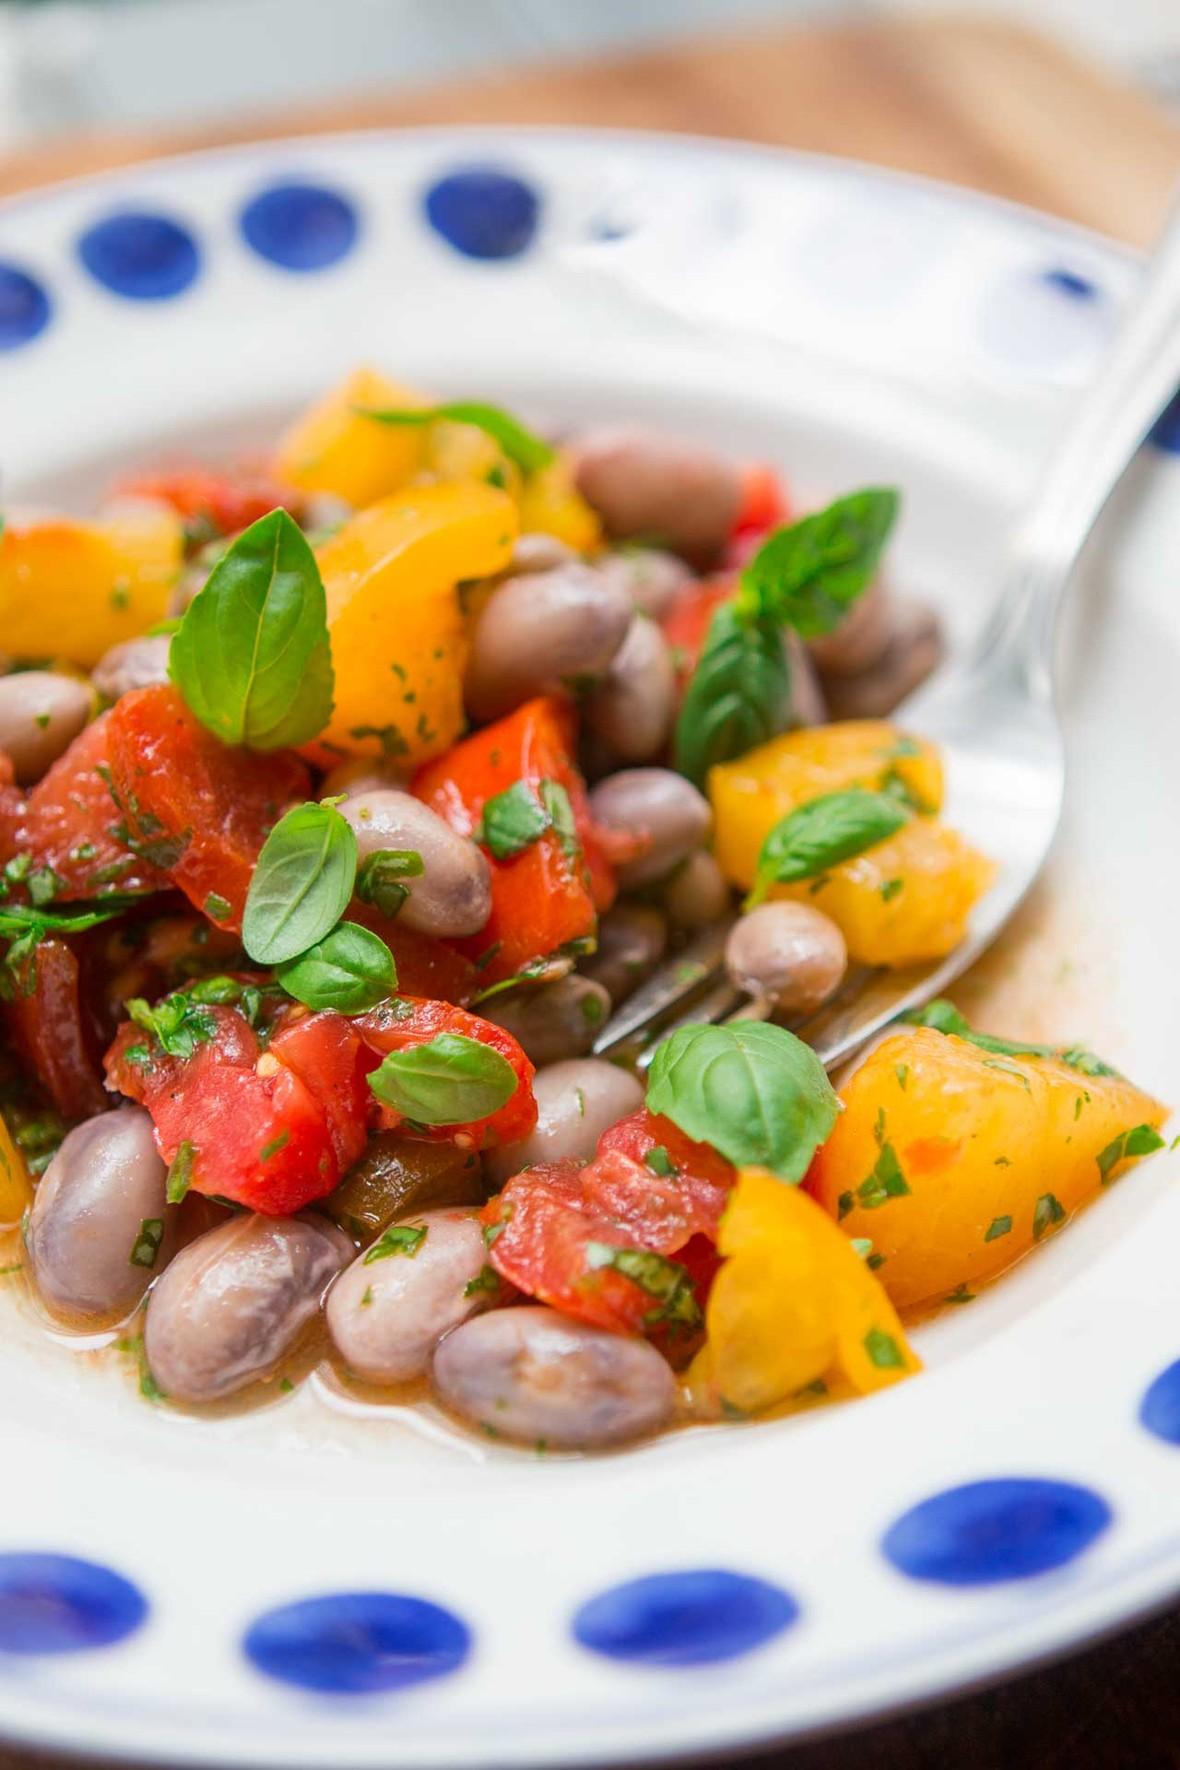 Tomato basil shelling bean salad recipe-6